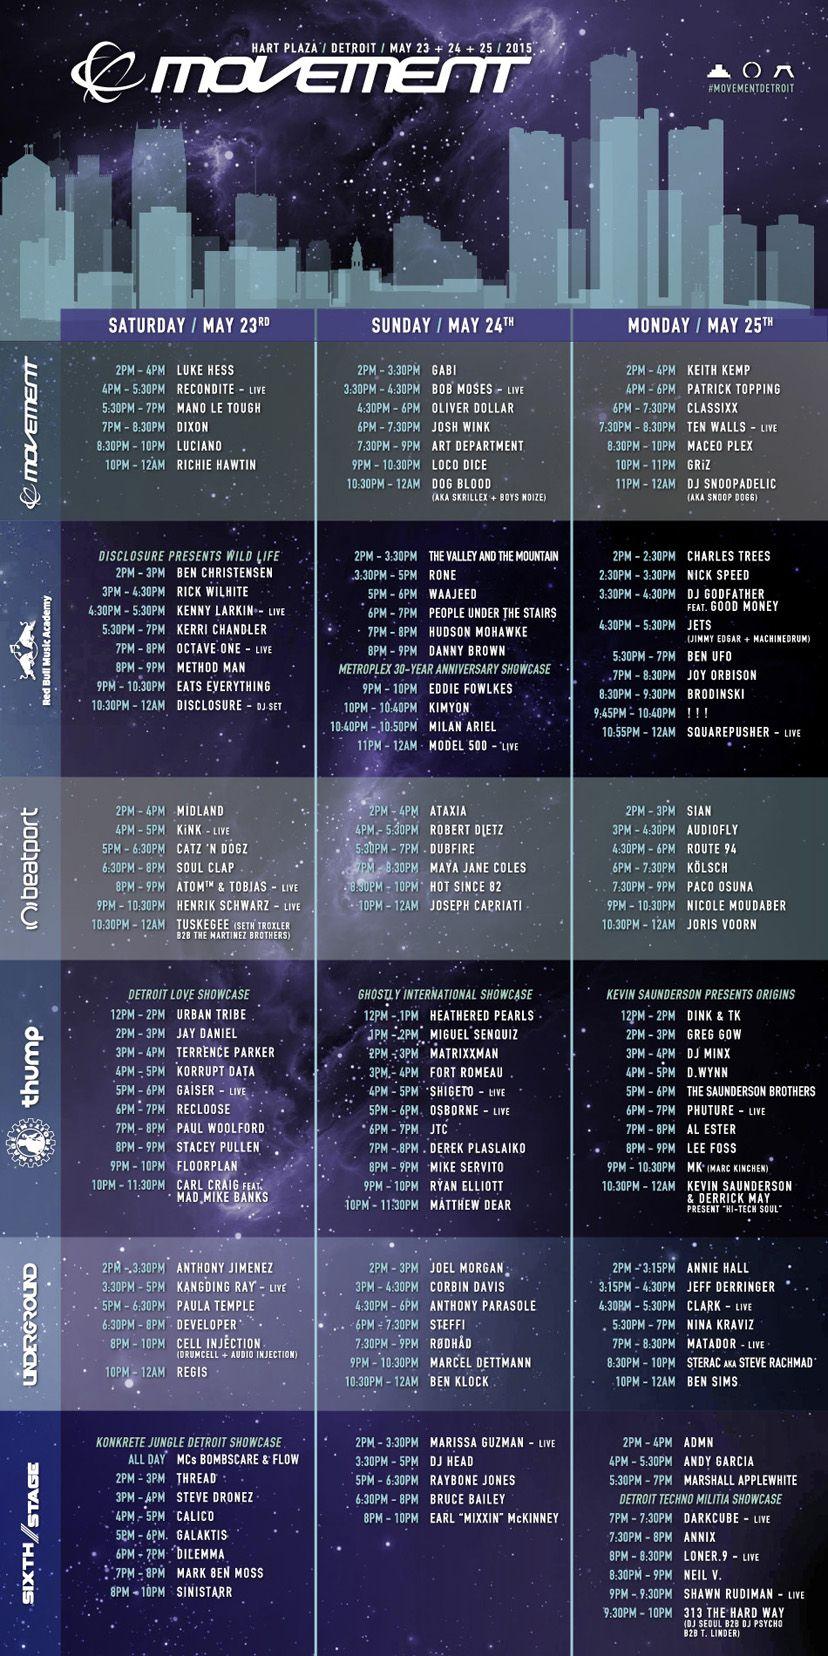 Movement 2015 Schedule Demf 2015 Dj Frequencies Detroit